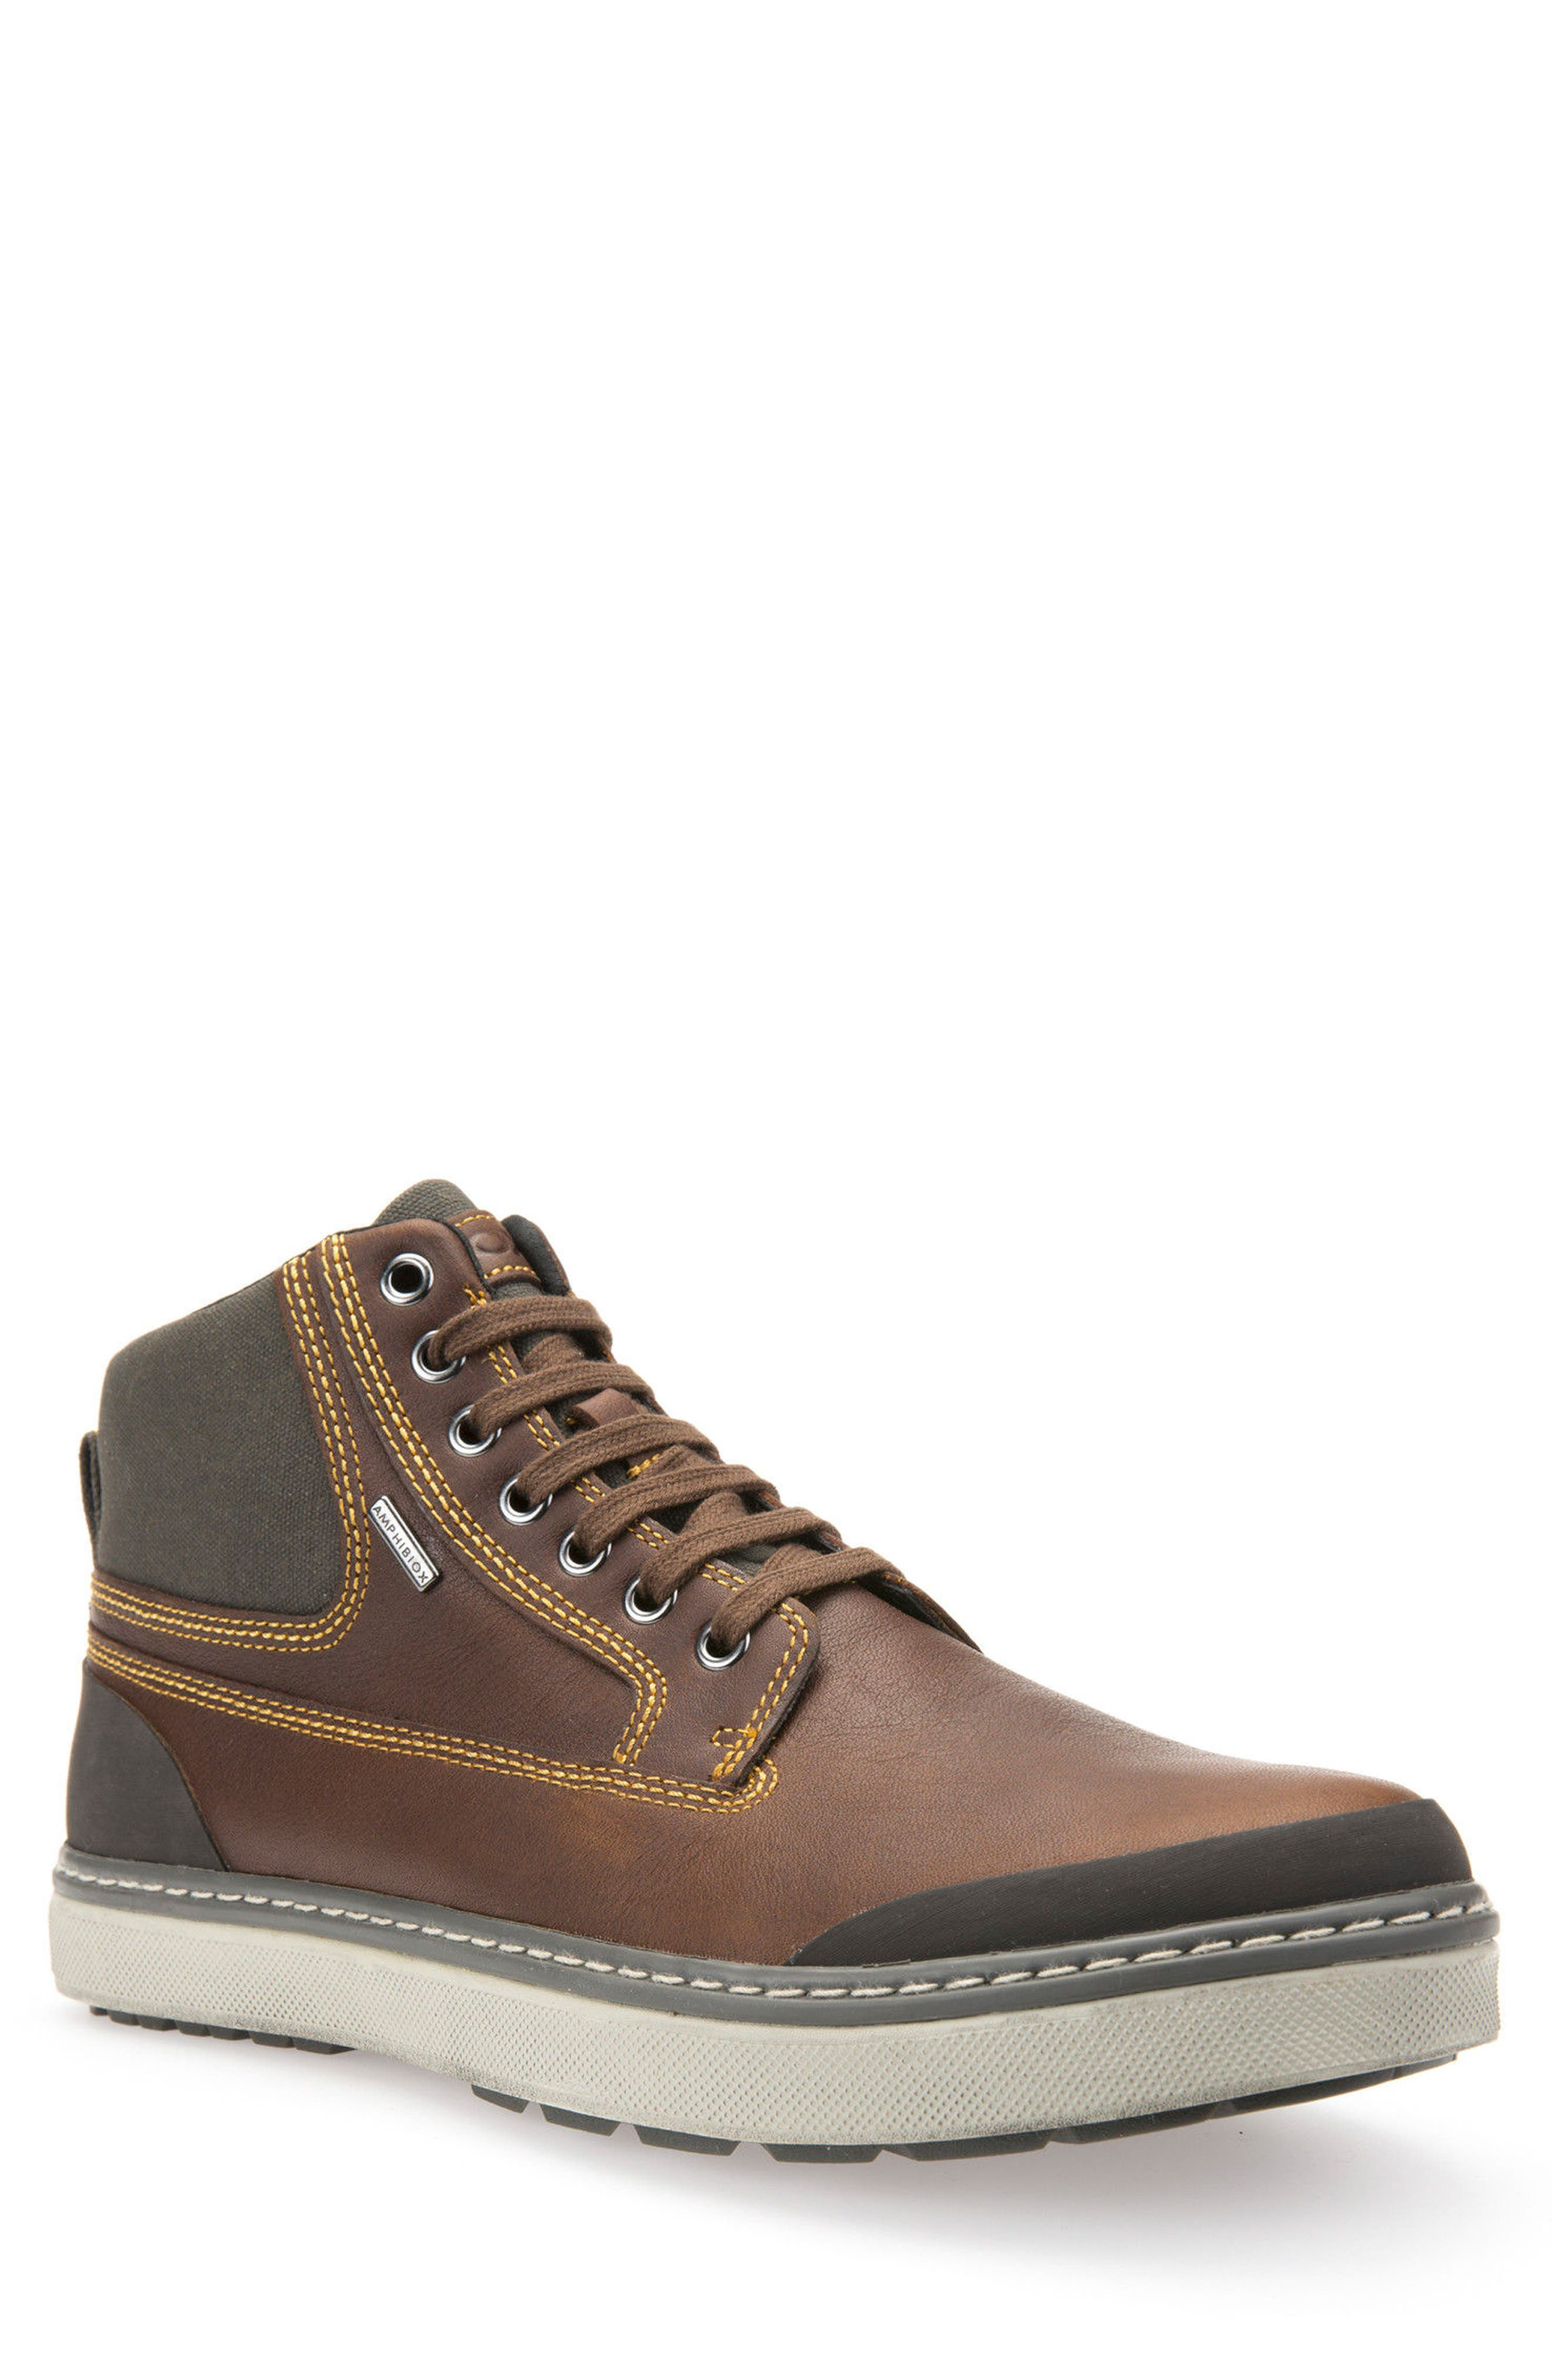 Mattias Amphibiox Waterproof Leather Sneaker,                         Main,                         color, 204